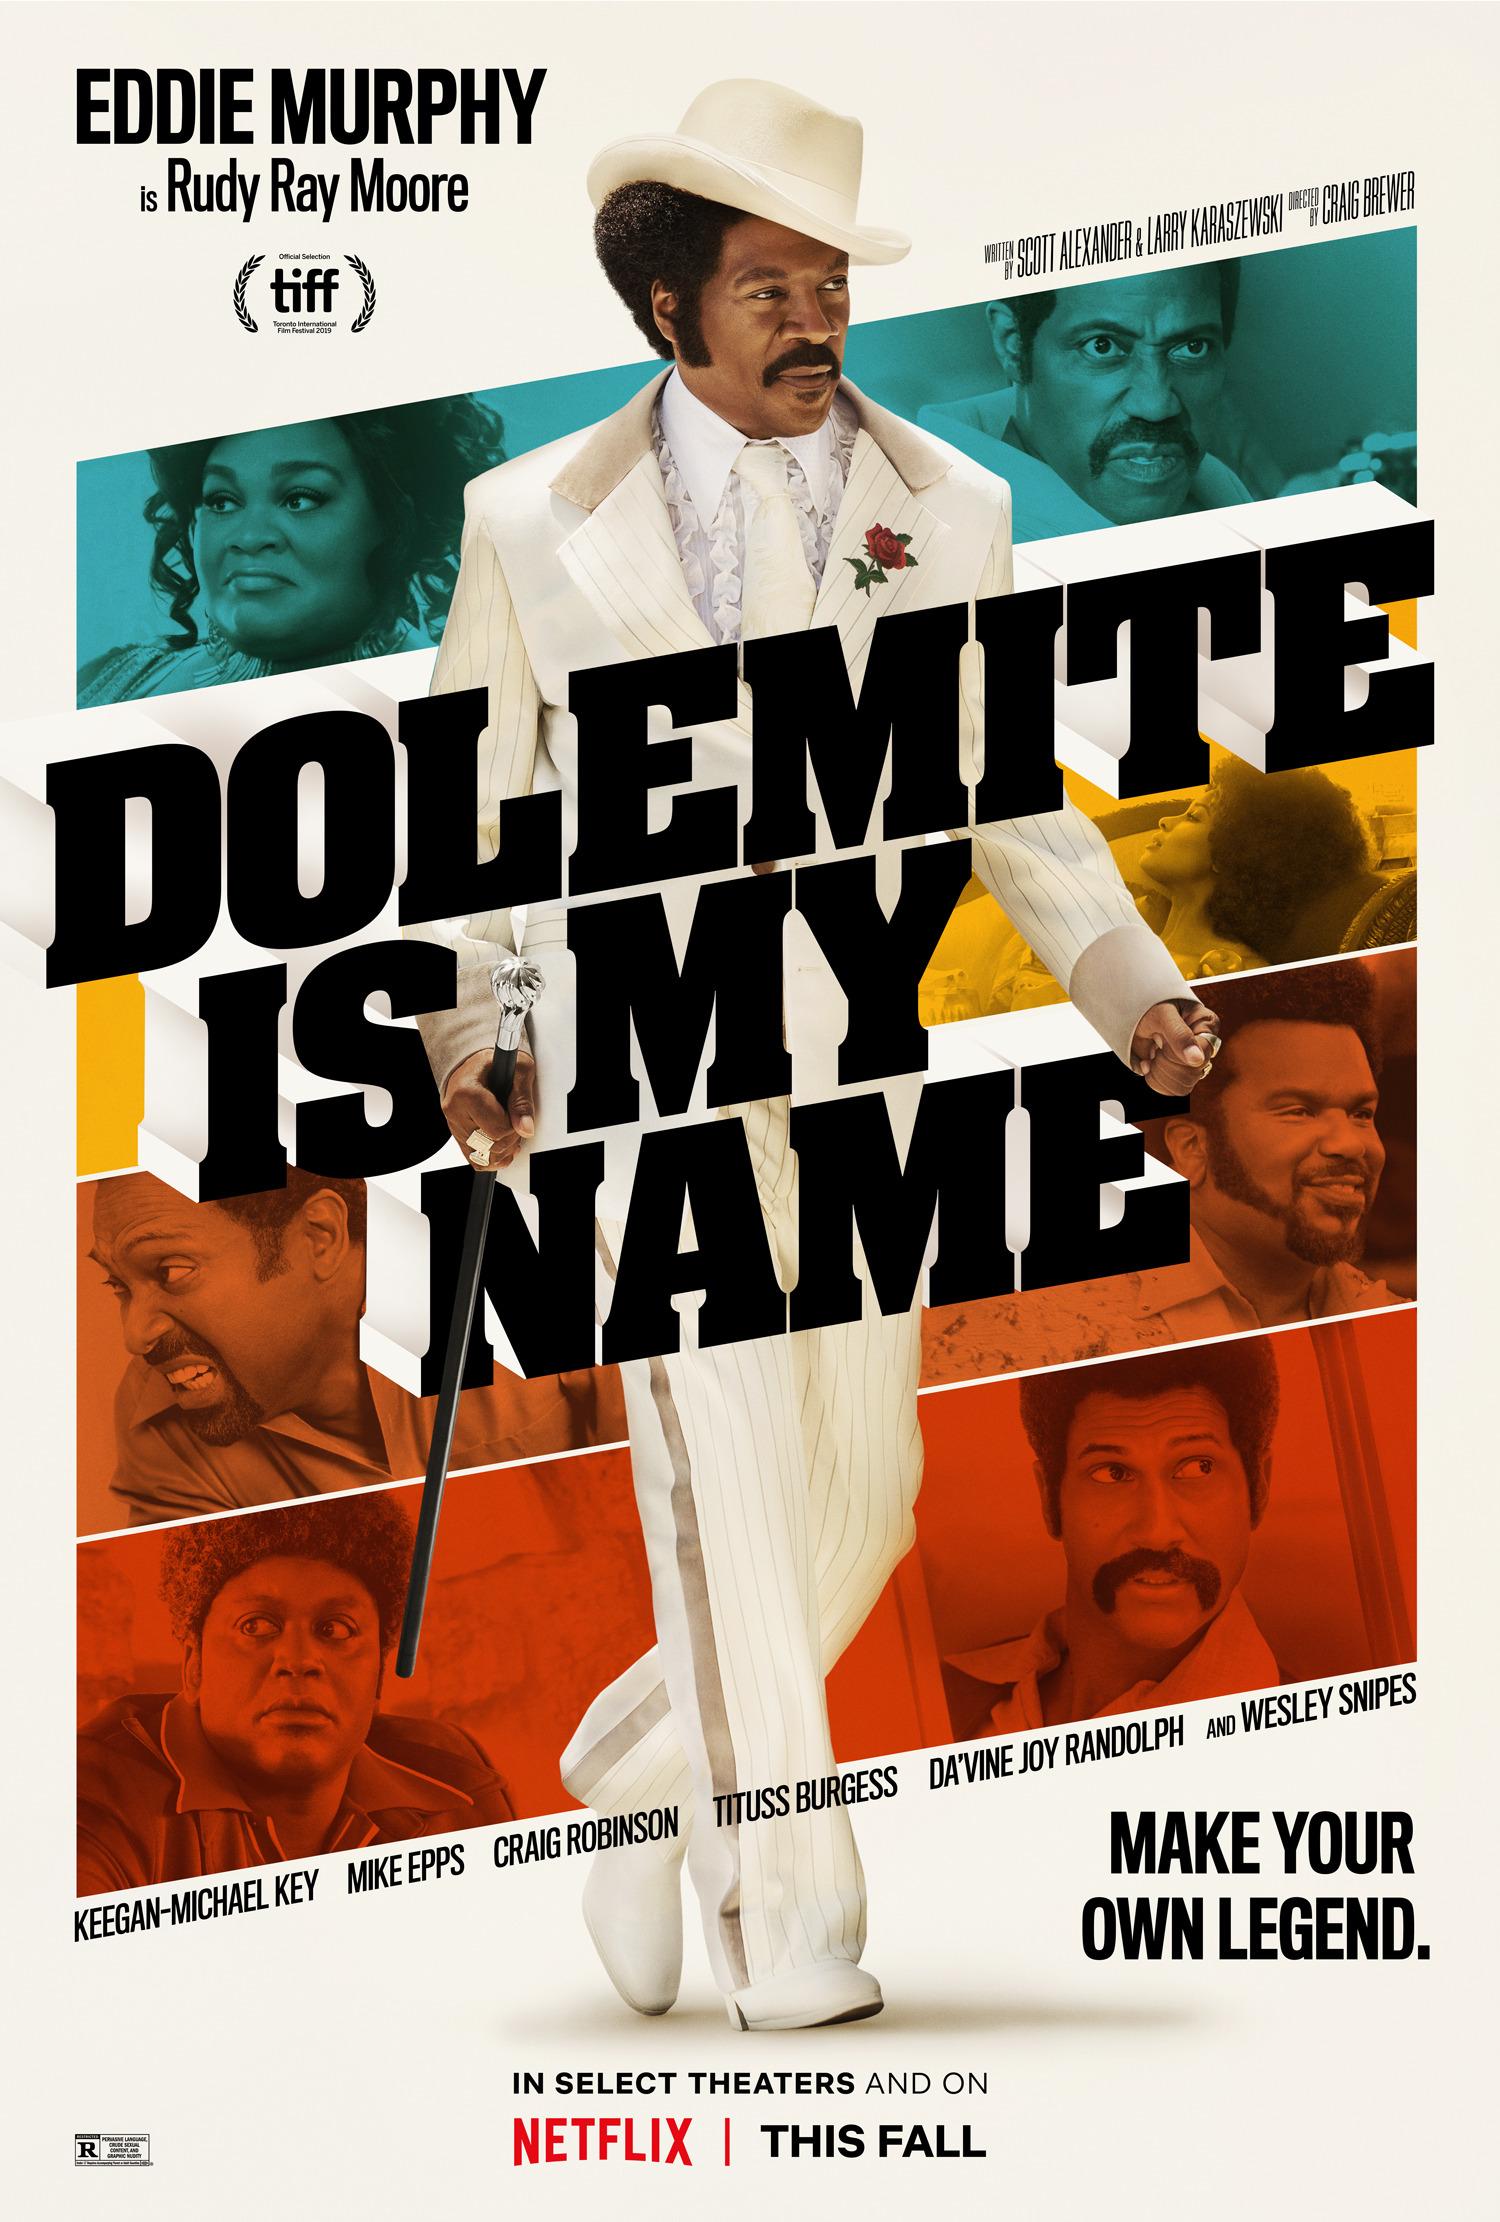 szmk_dolemite_is_my_name_a_nevem_eddie_murphy.jpg